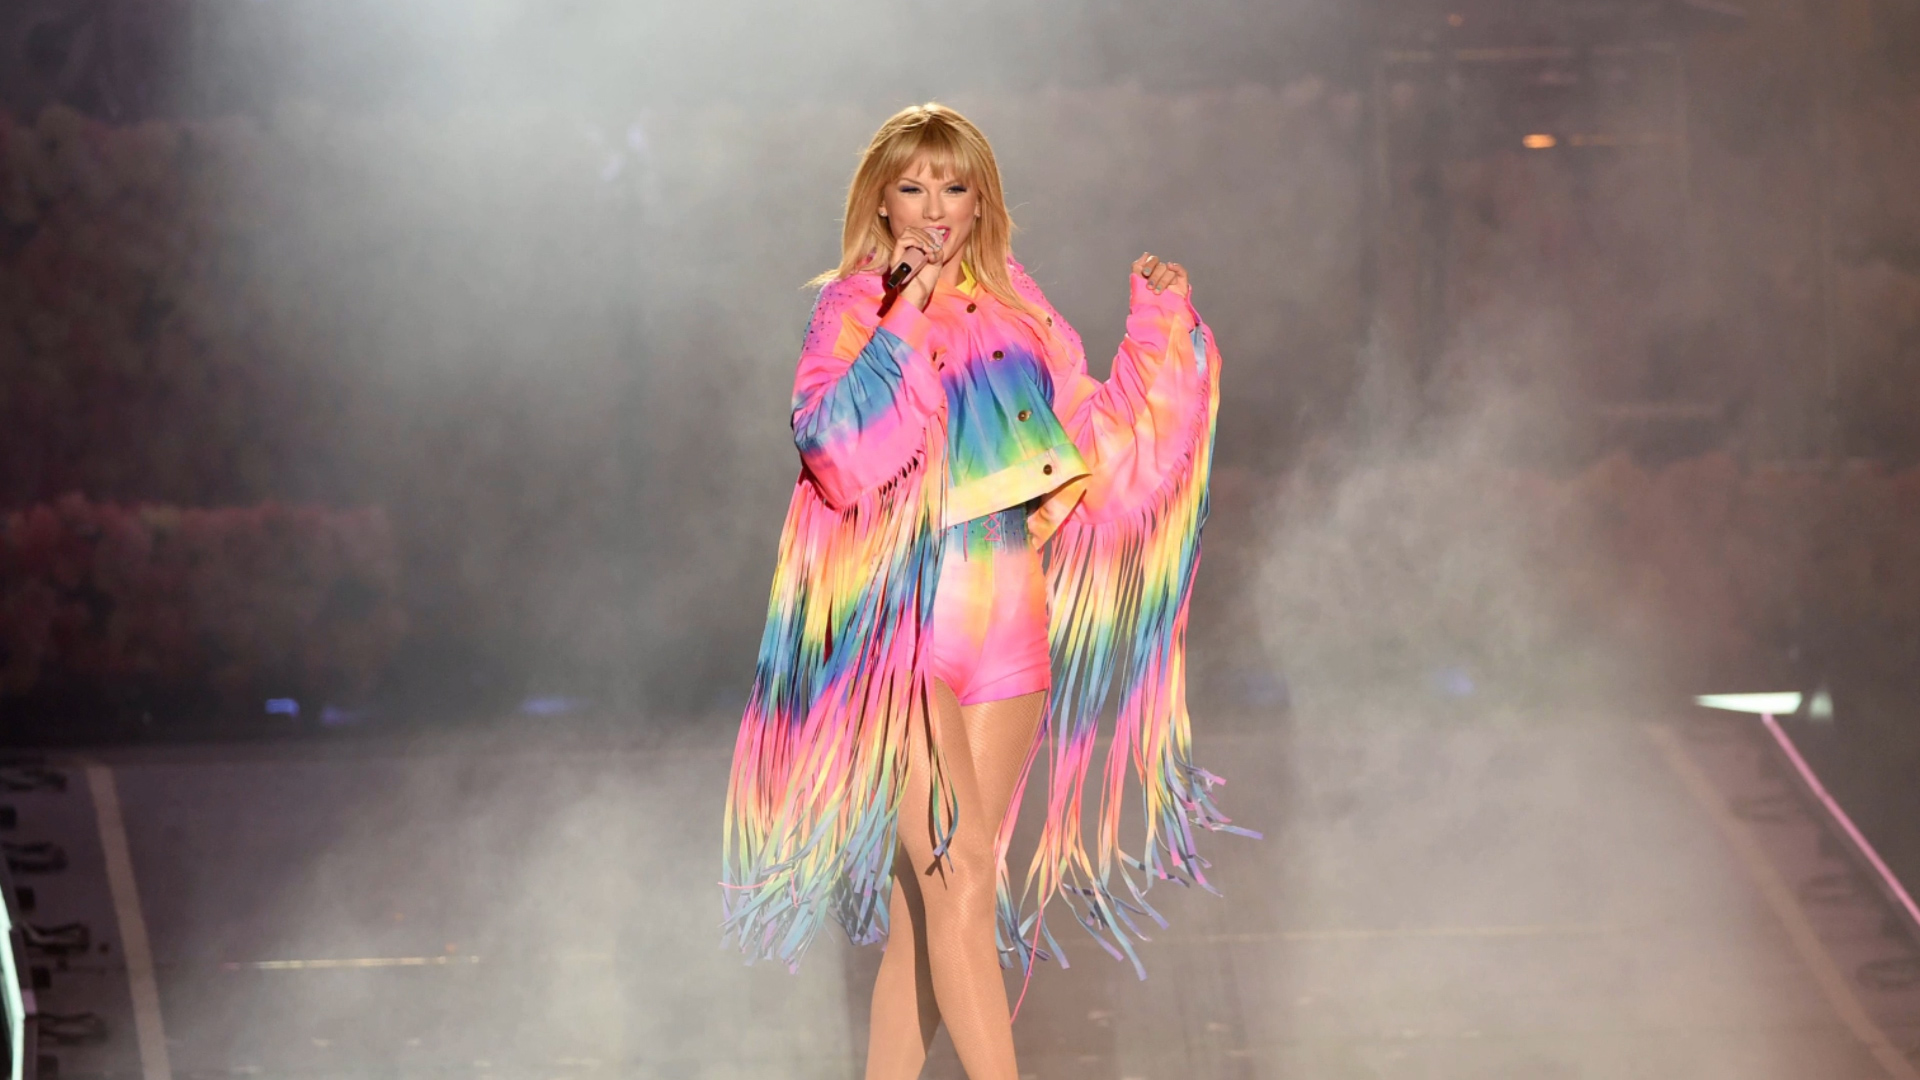 Polish LGBTQ Advocates Use Taylor Swift's Hit To Push Back Against Bigotry